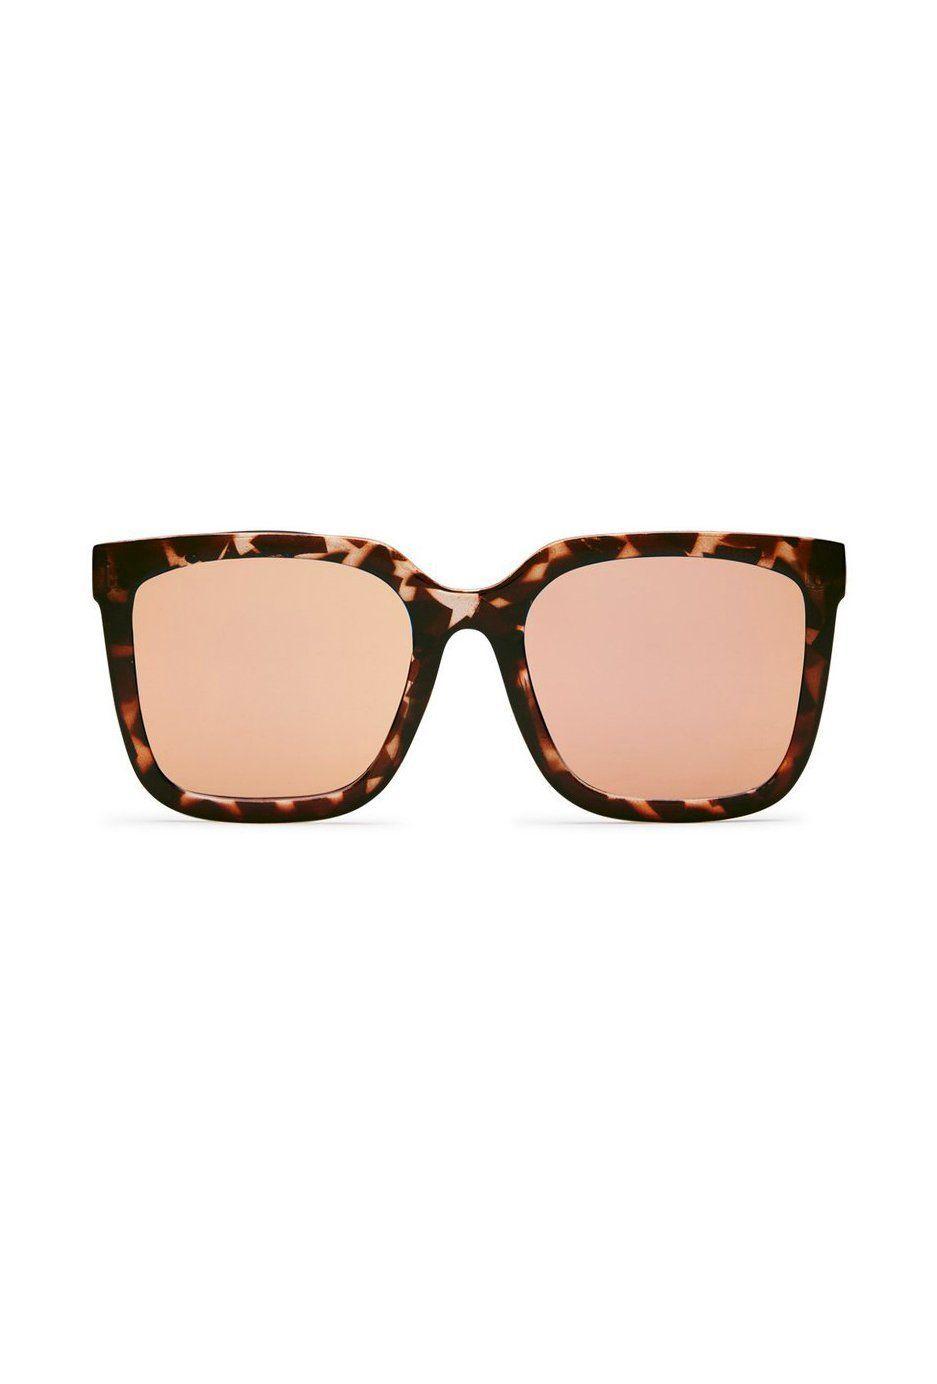 aae6382b91 Genesis Sunglasses. Genesis Sunglasses Quay Australia ...